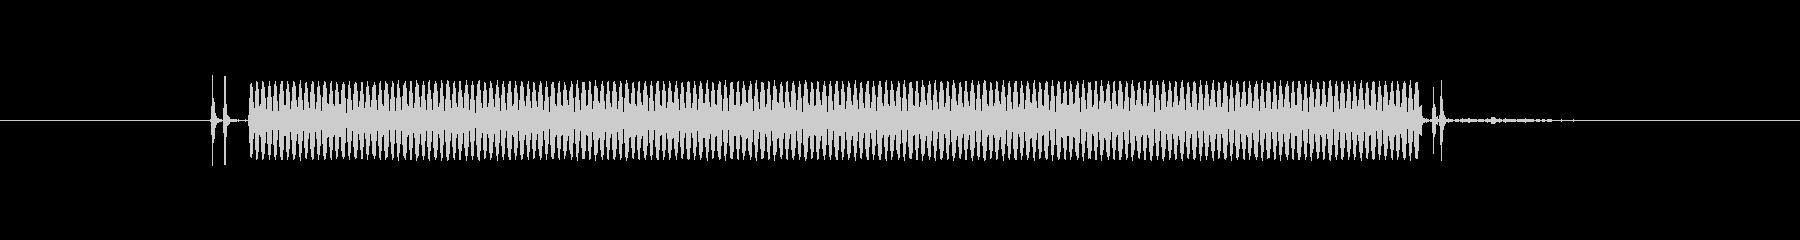 DIAL 0電話の未再生の波形